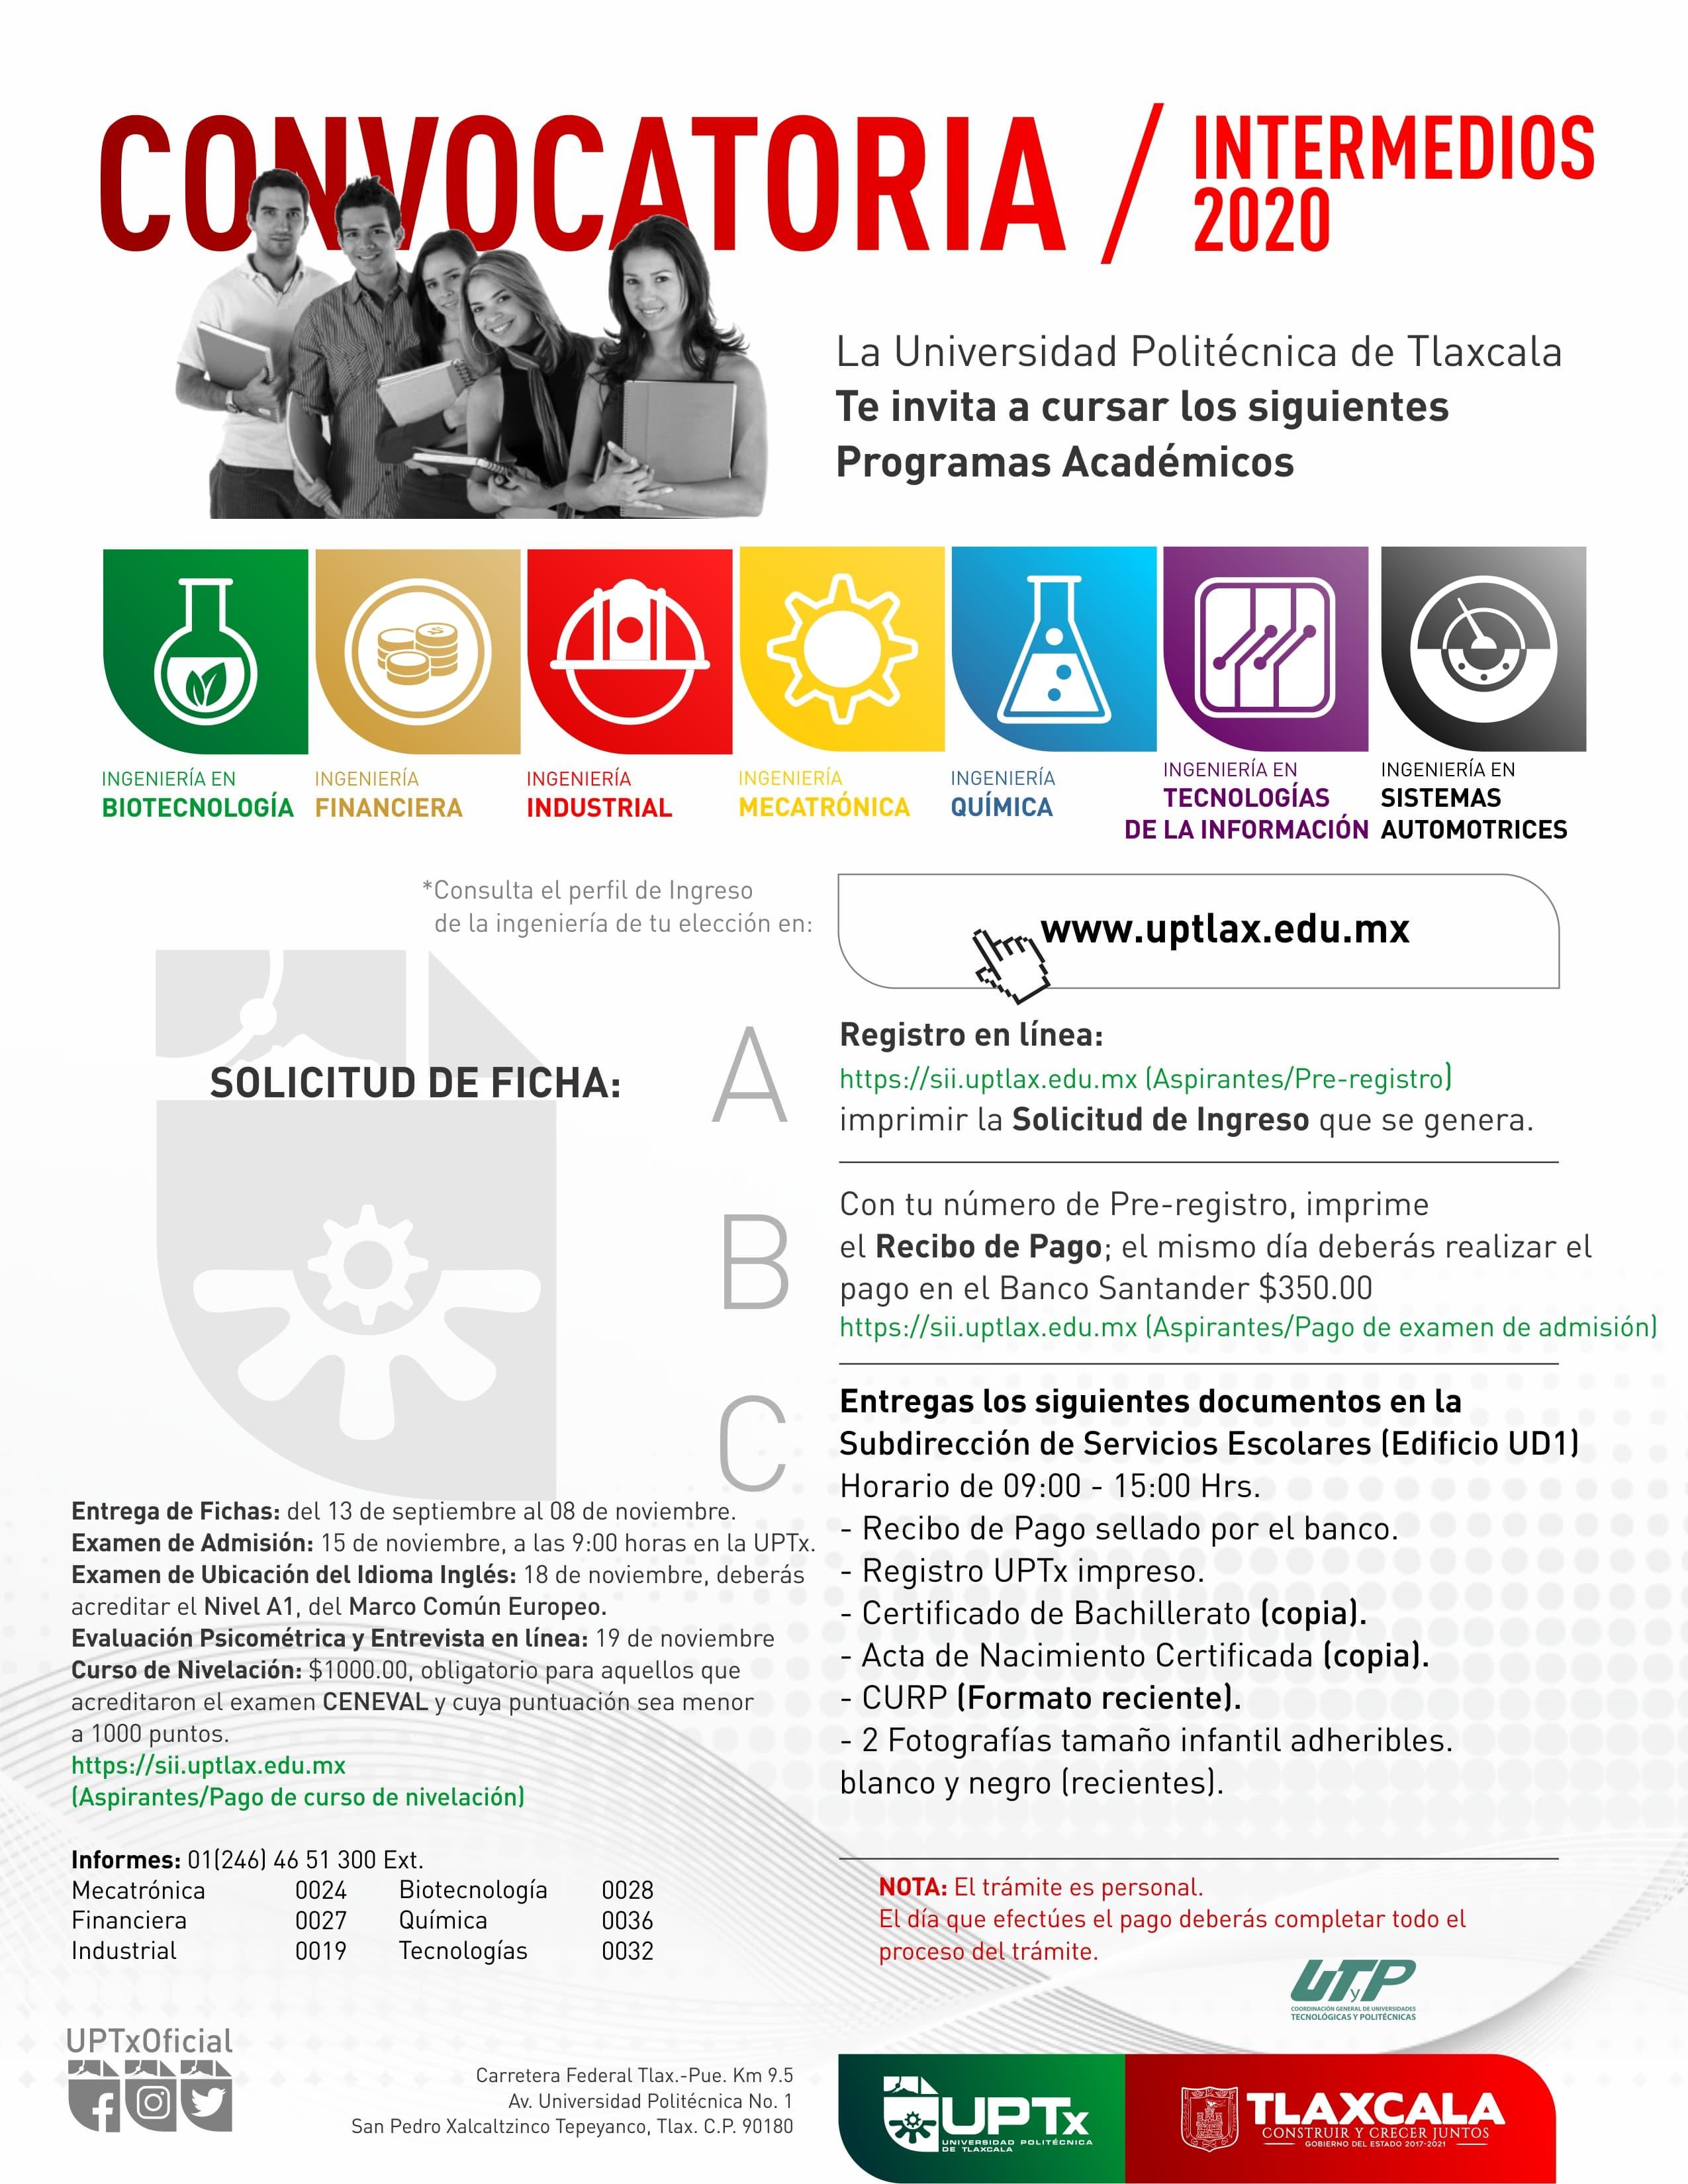 CONVOCATORIA Intermedios 2020-min